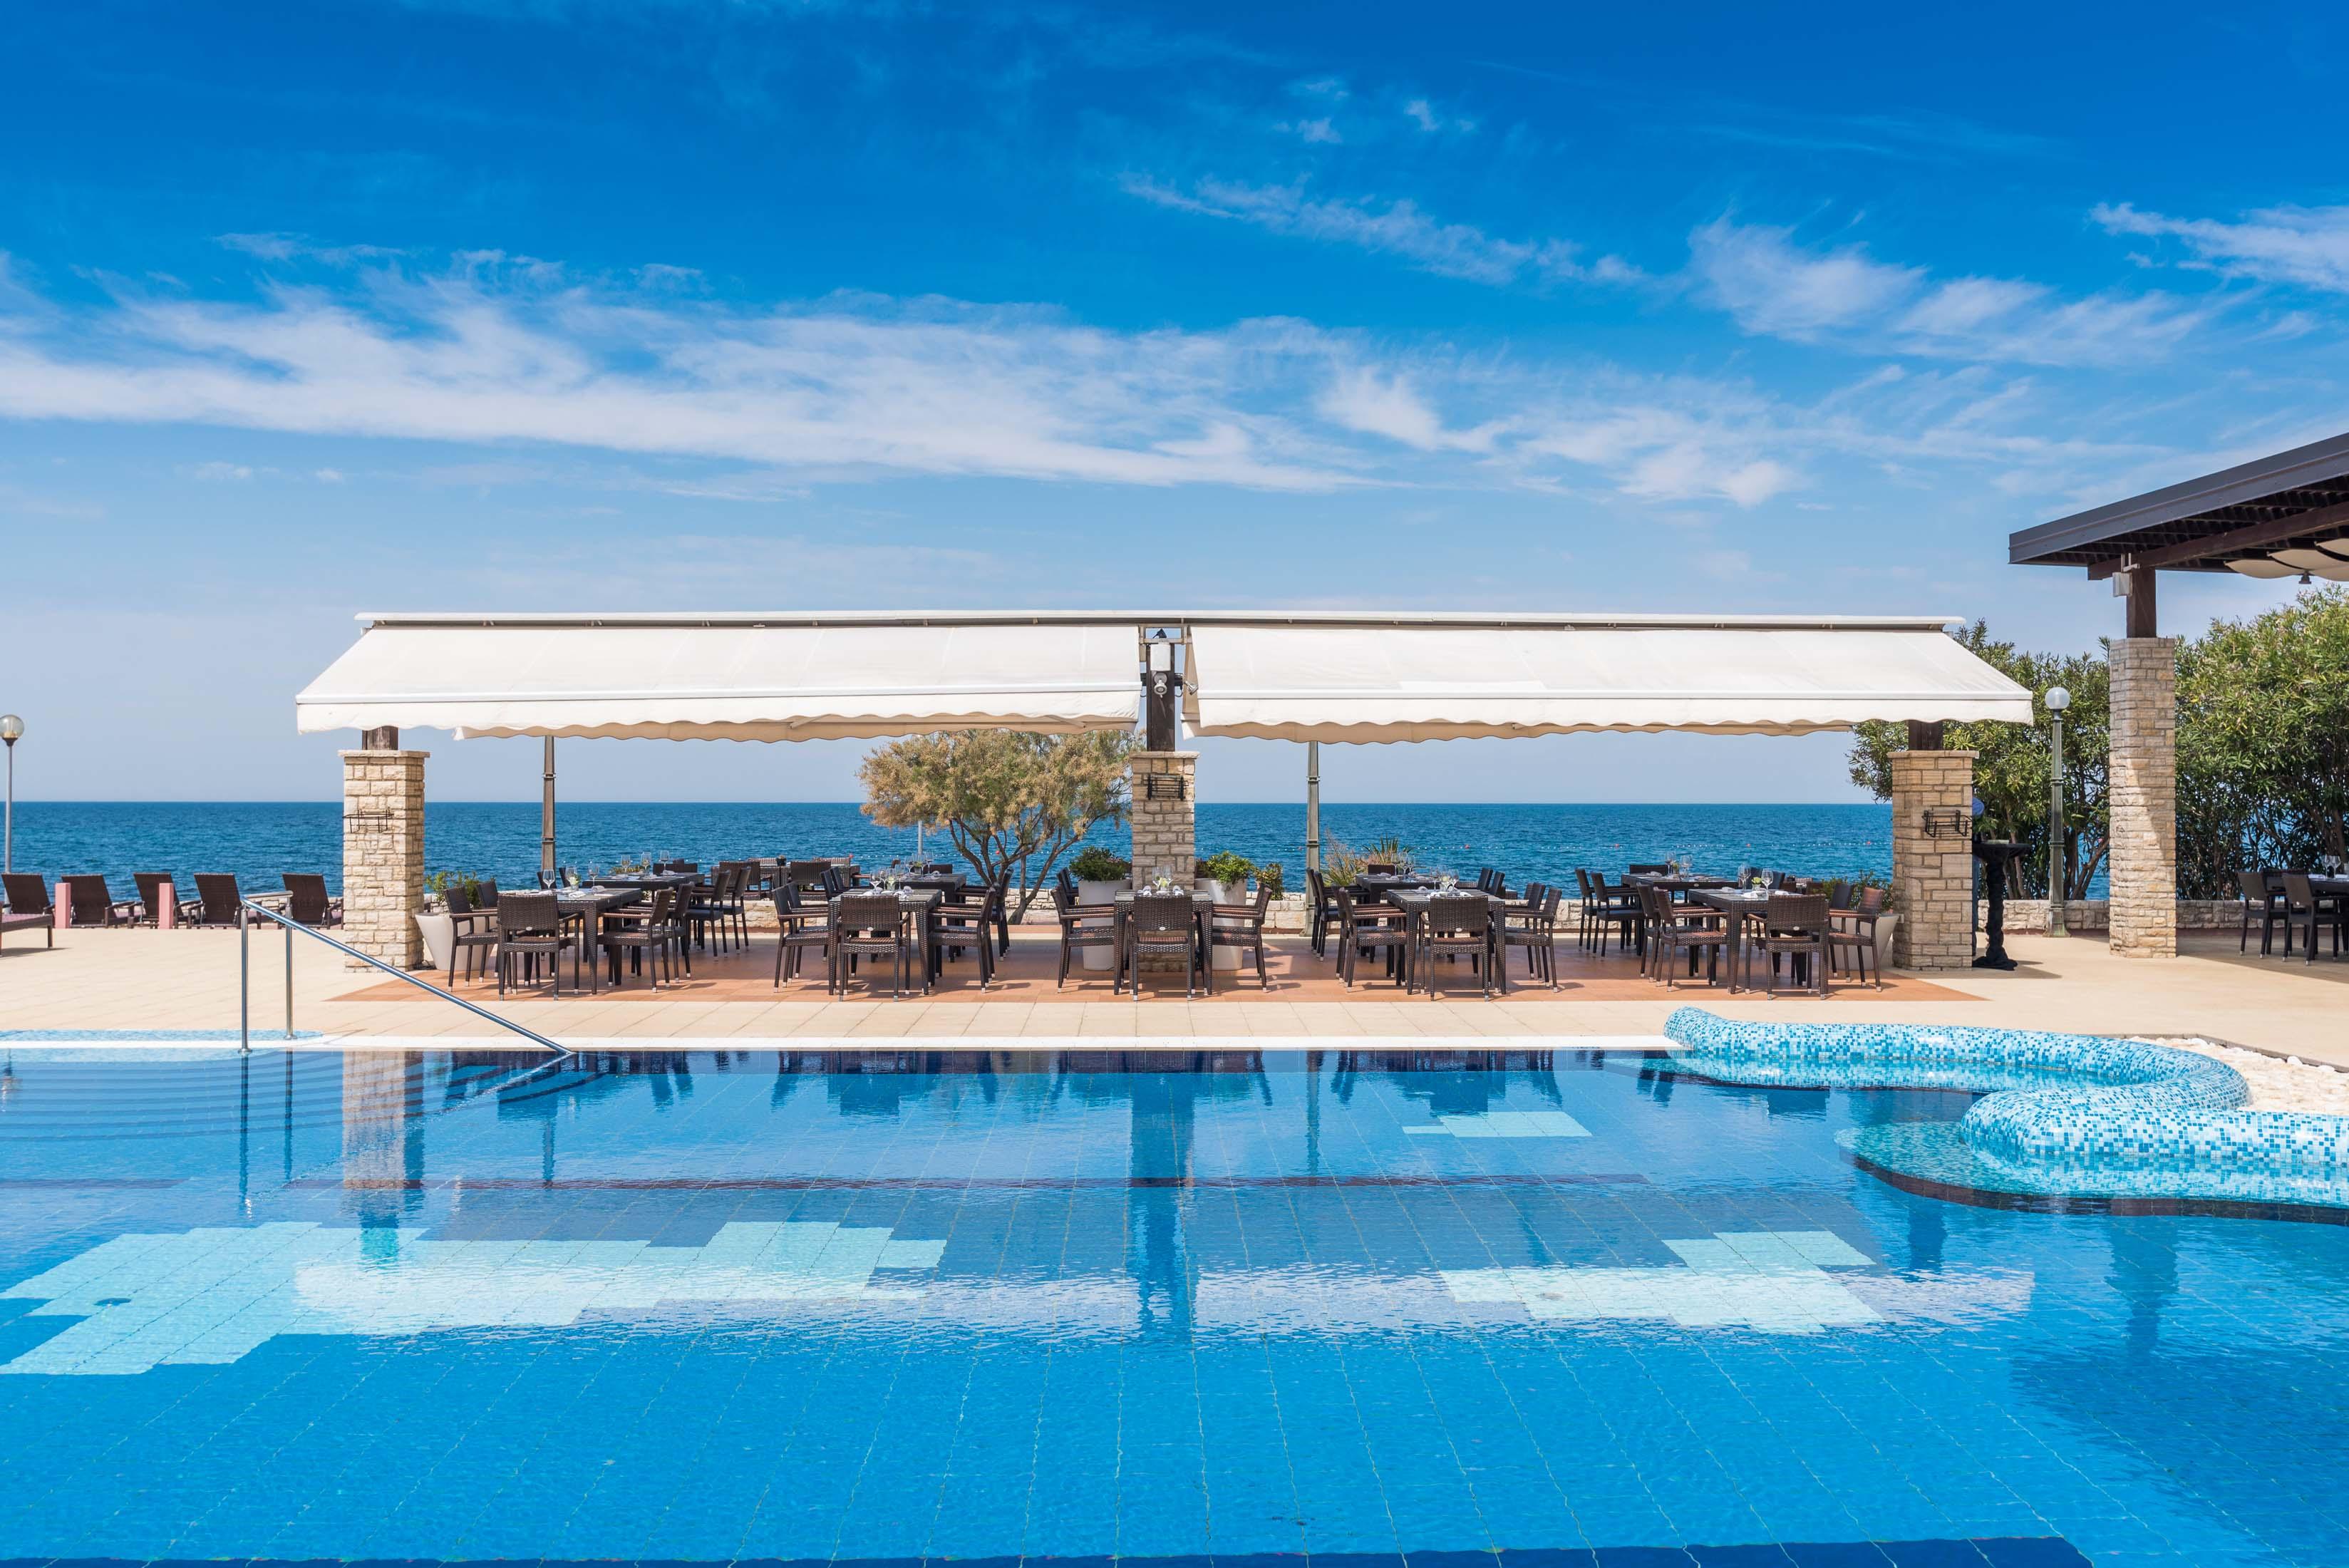 https://cms.satur.sk/data/imgs/tour_image/orig/stella-maris-resort-2016-restaurants-o-grille_-3-1-1800584.jpg